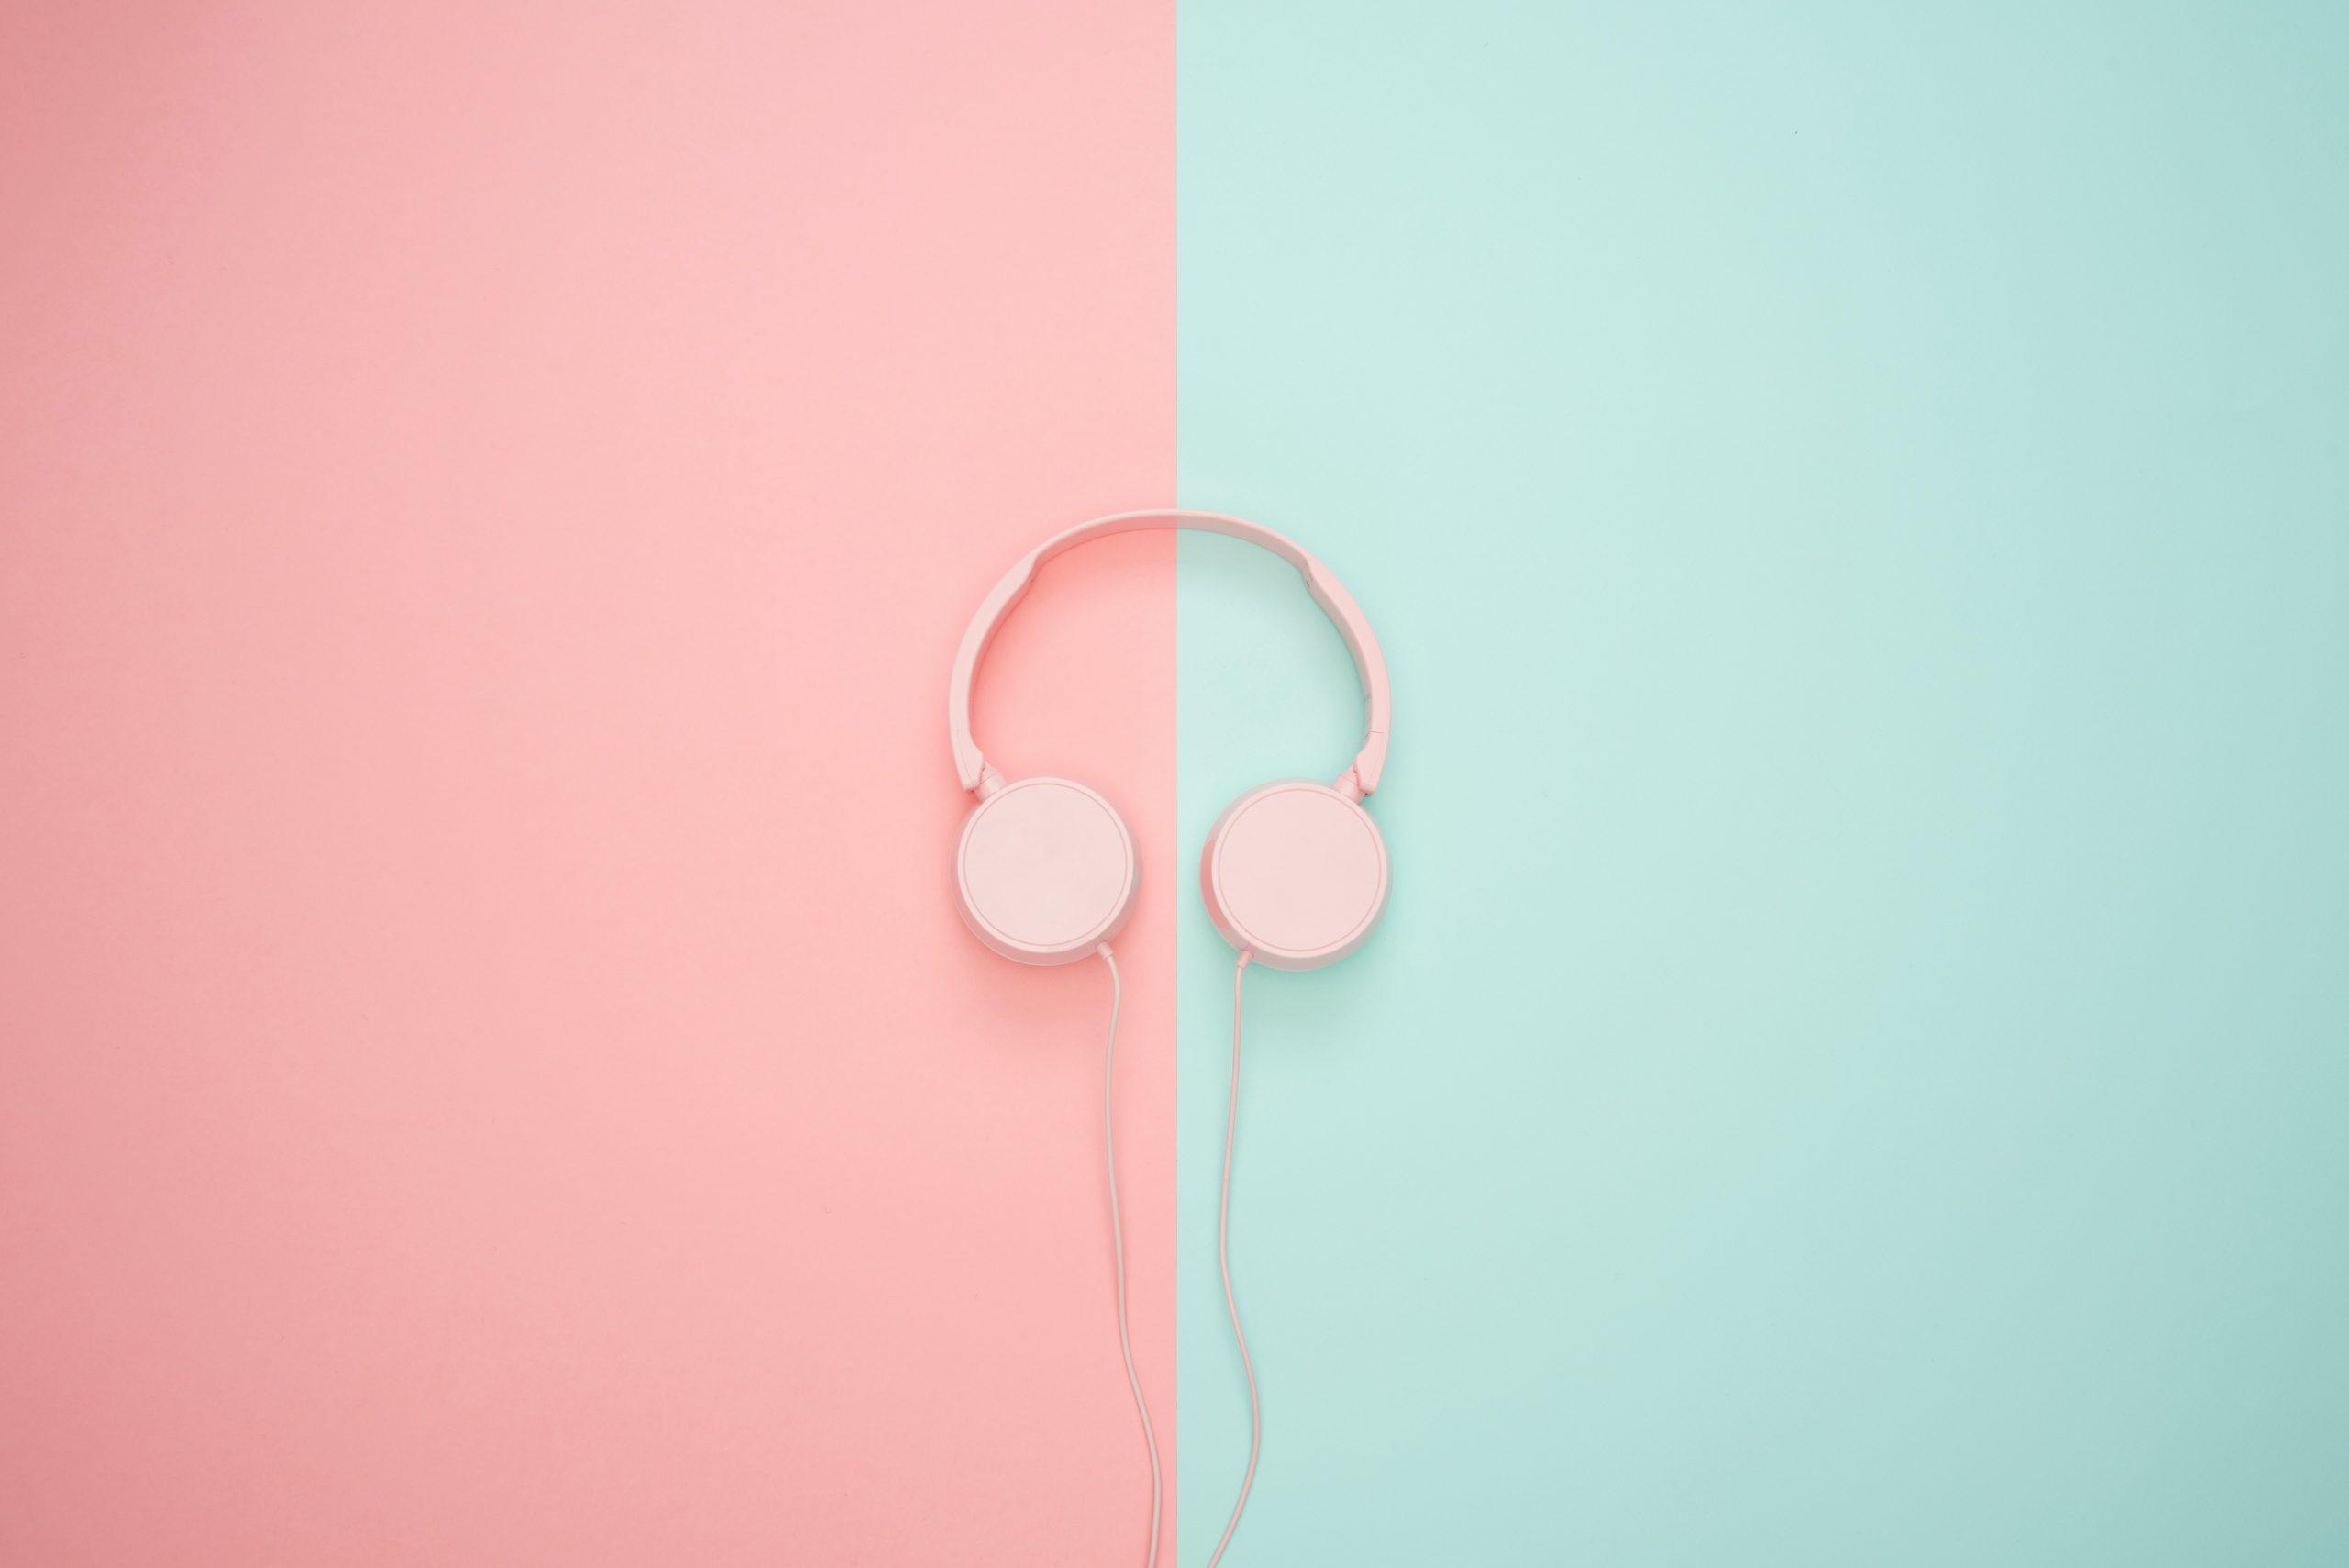 A pair of pink headphones lays on a half-pink half-blue floor